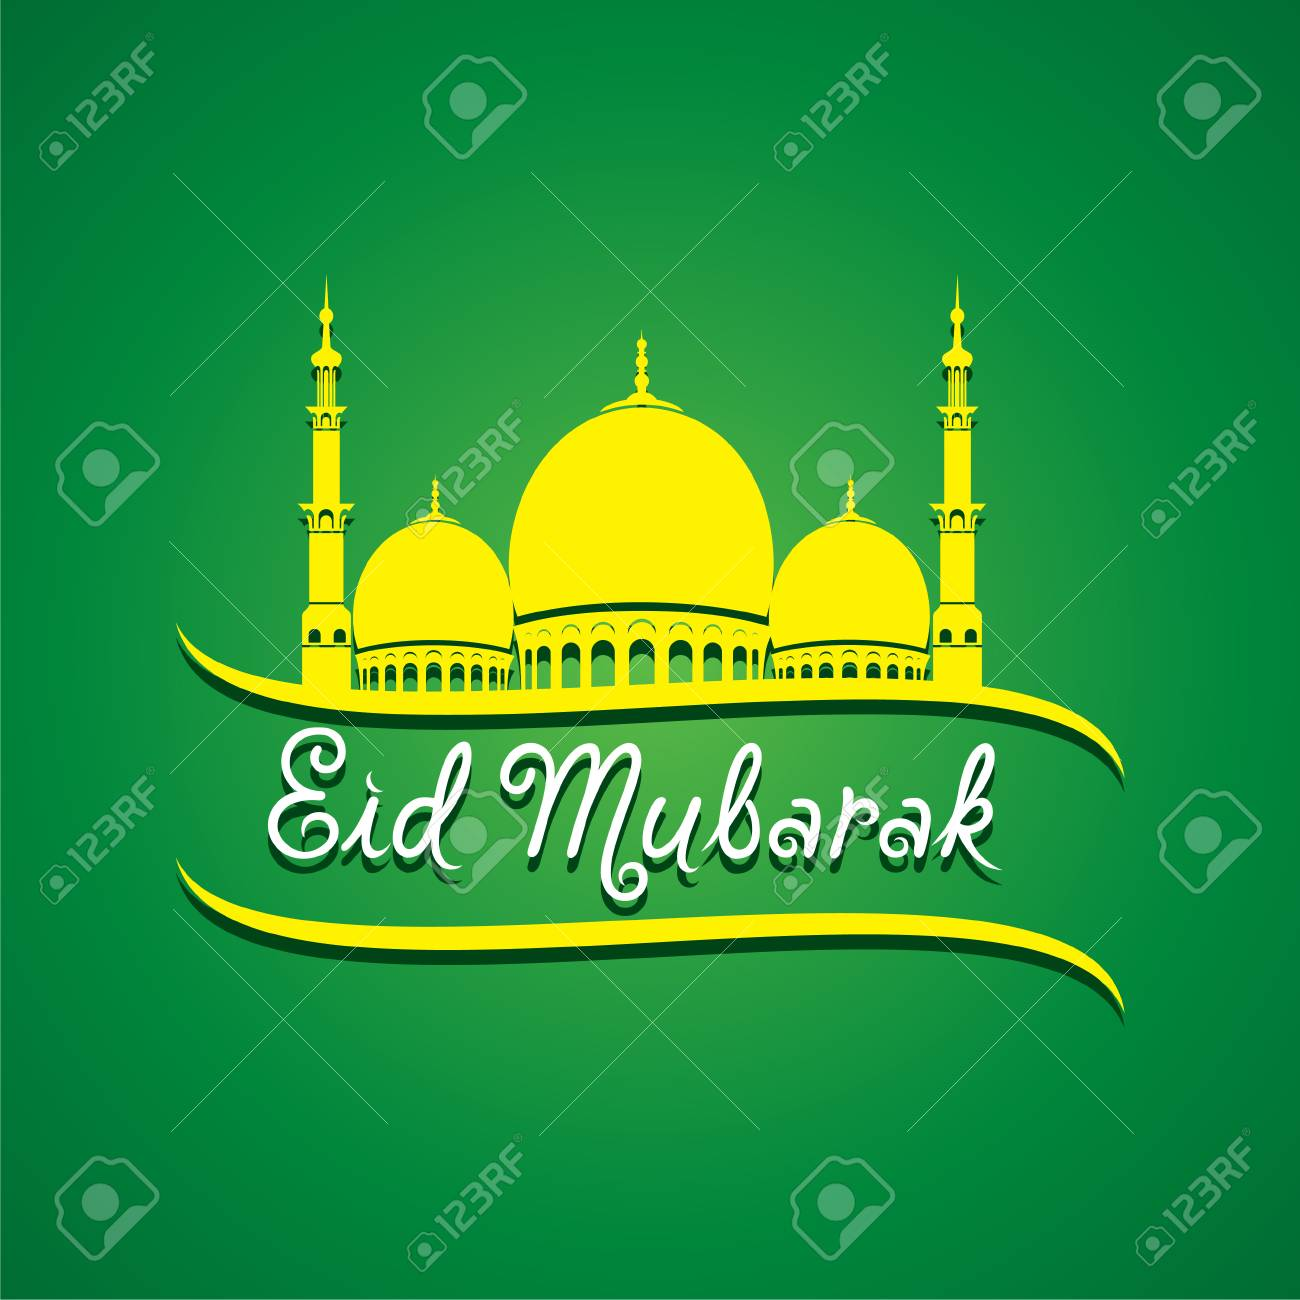 Eid mubarak islamic festival greeting card vector royalty free eid mubarak islamic festival greeting card vector stock vector 61237973 m4hsunfo